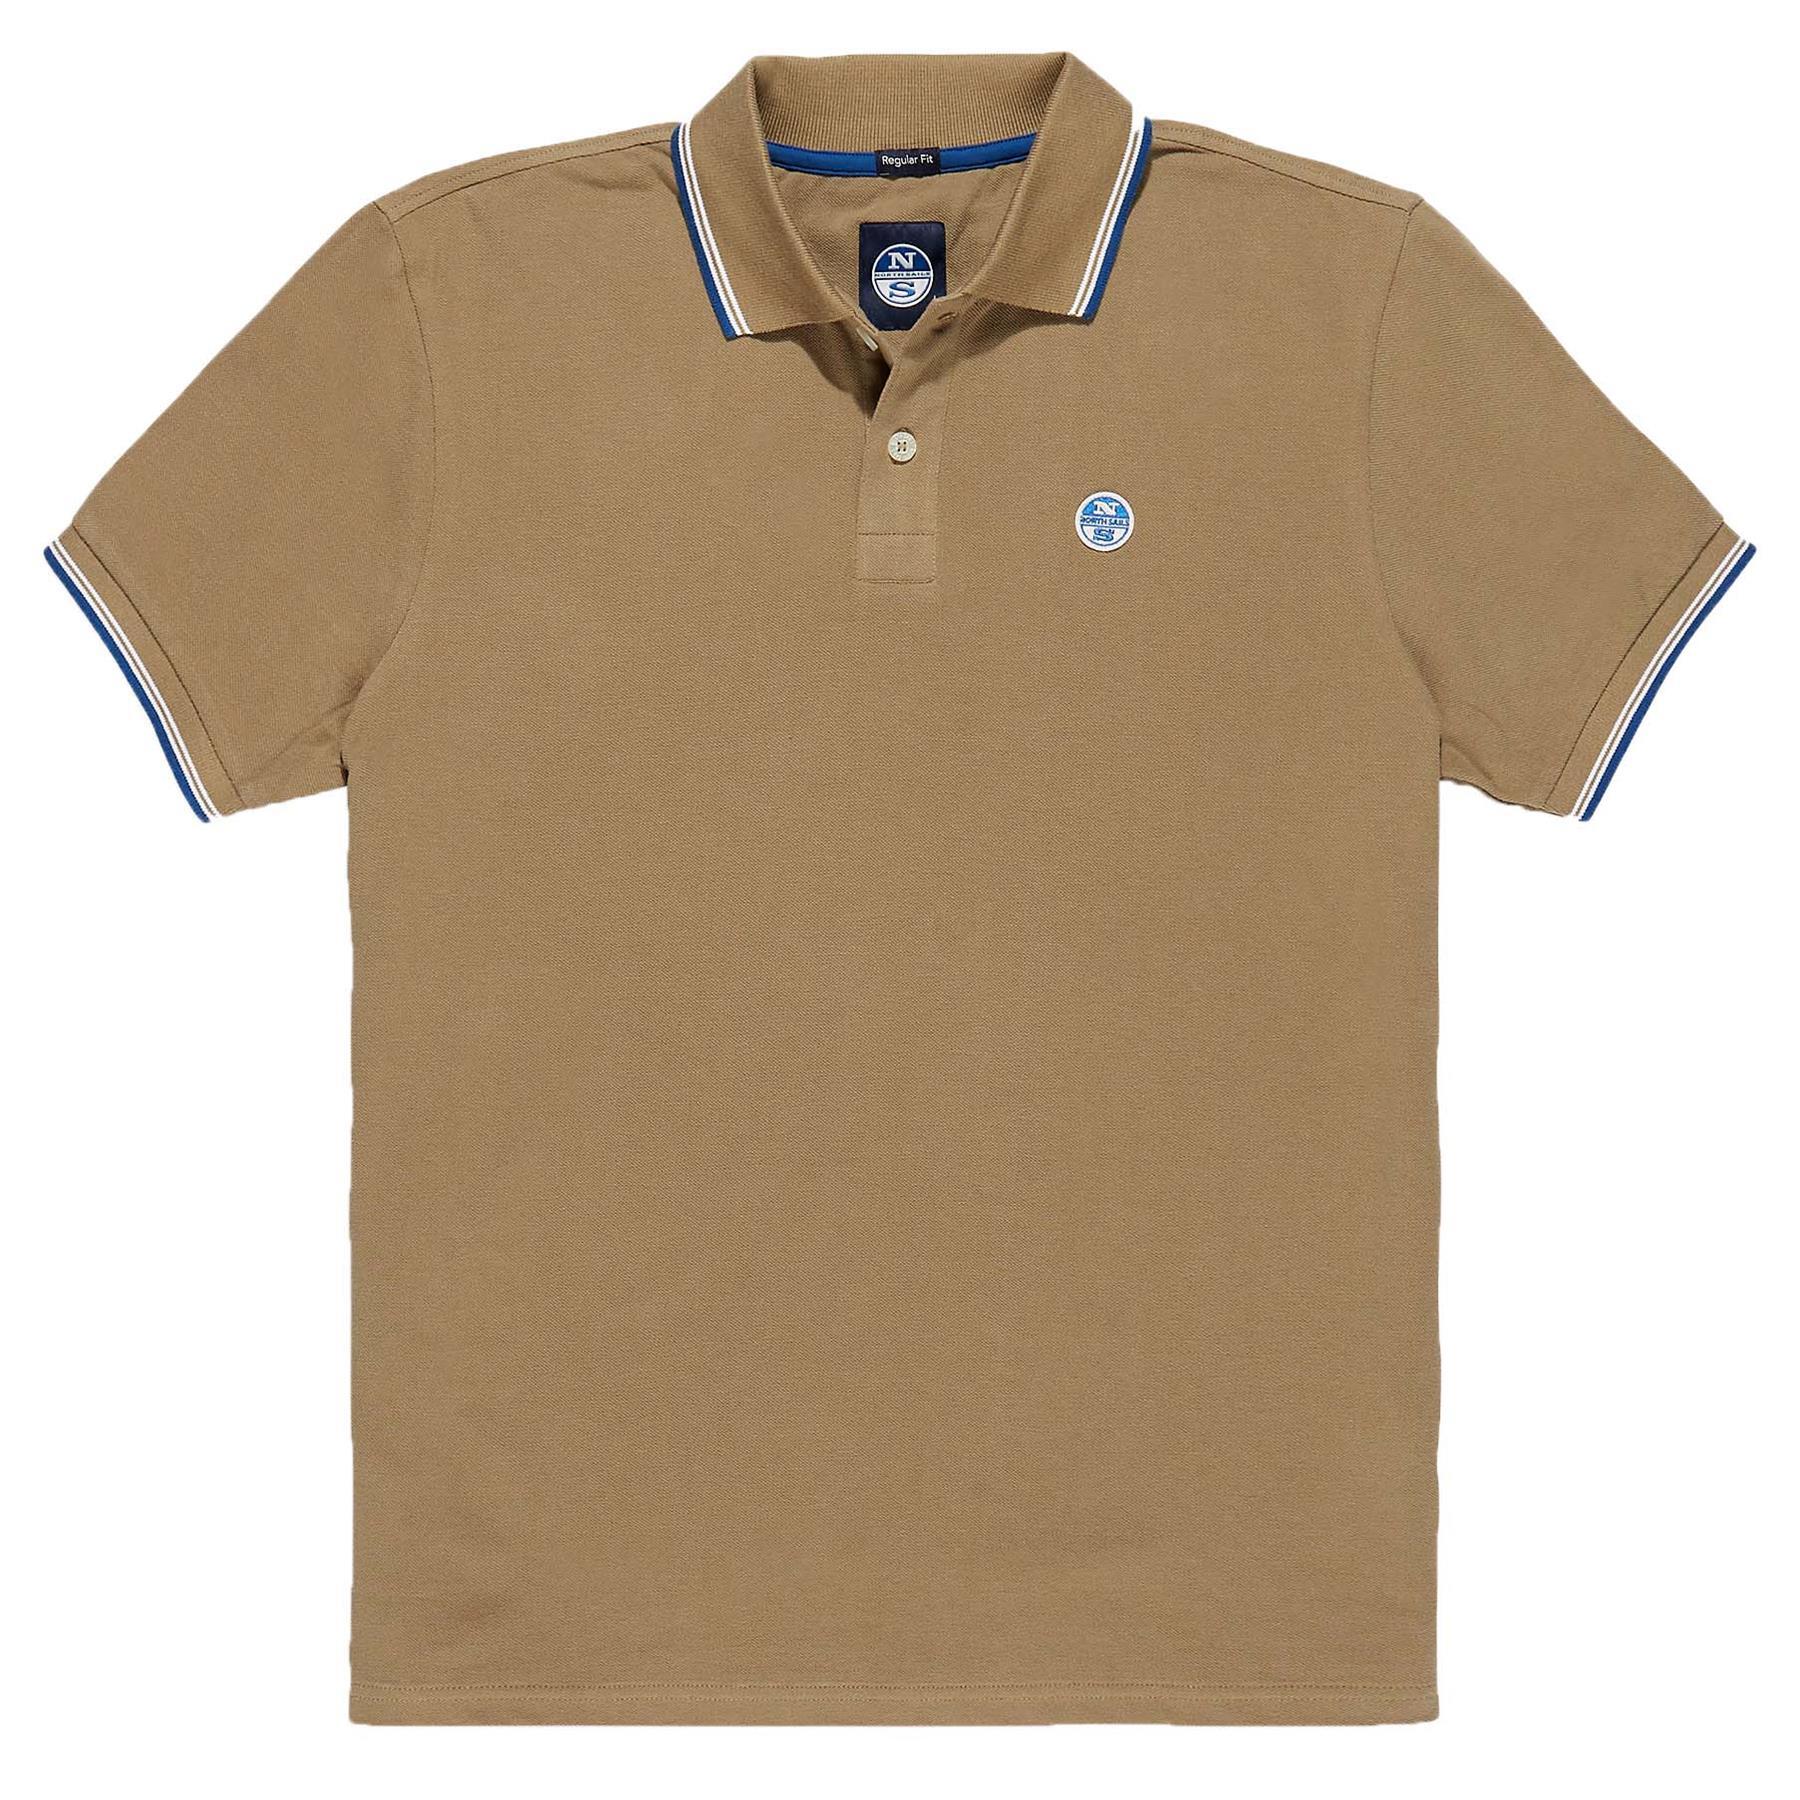 NORTH-SAILS-Mens-Legacy-Heritage-Short-Sleeve-Polo-Shirt-SALE-RRP-50 thumbnail 19